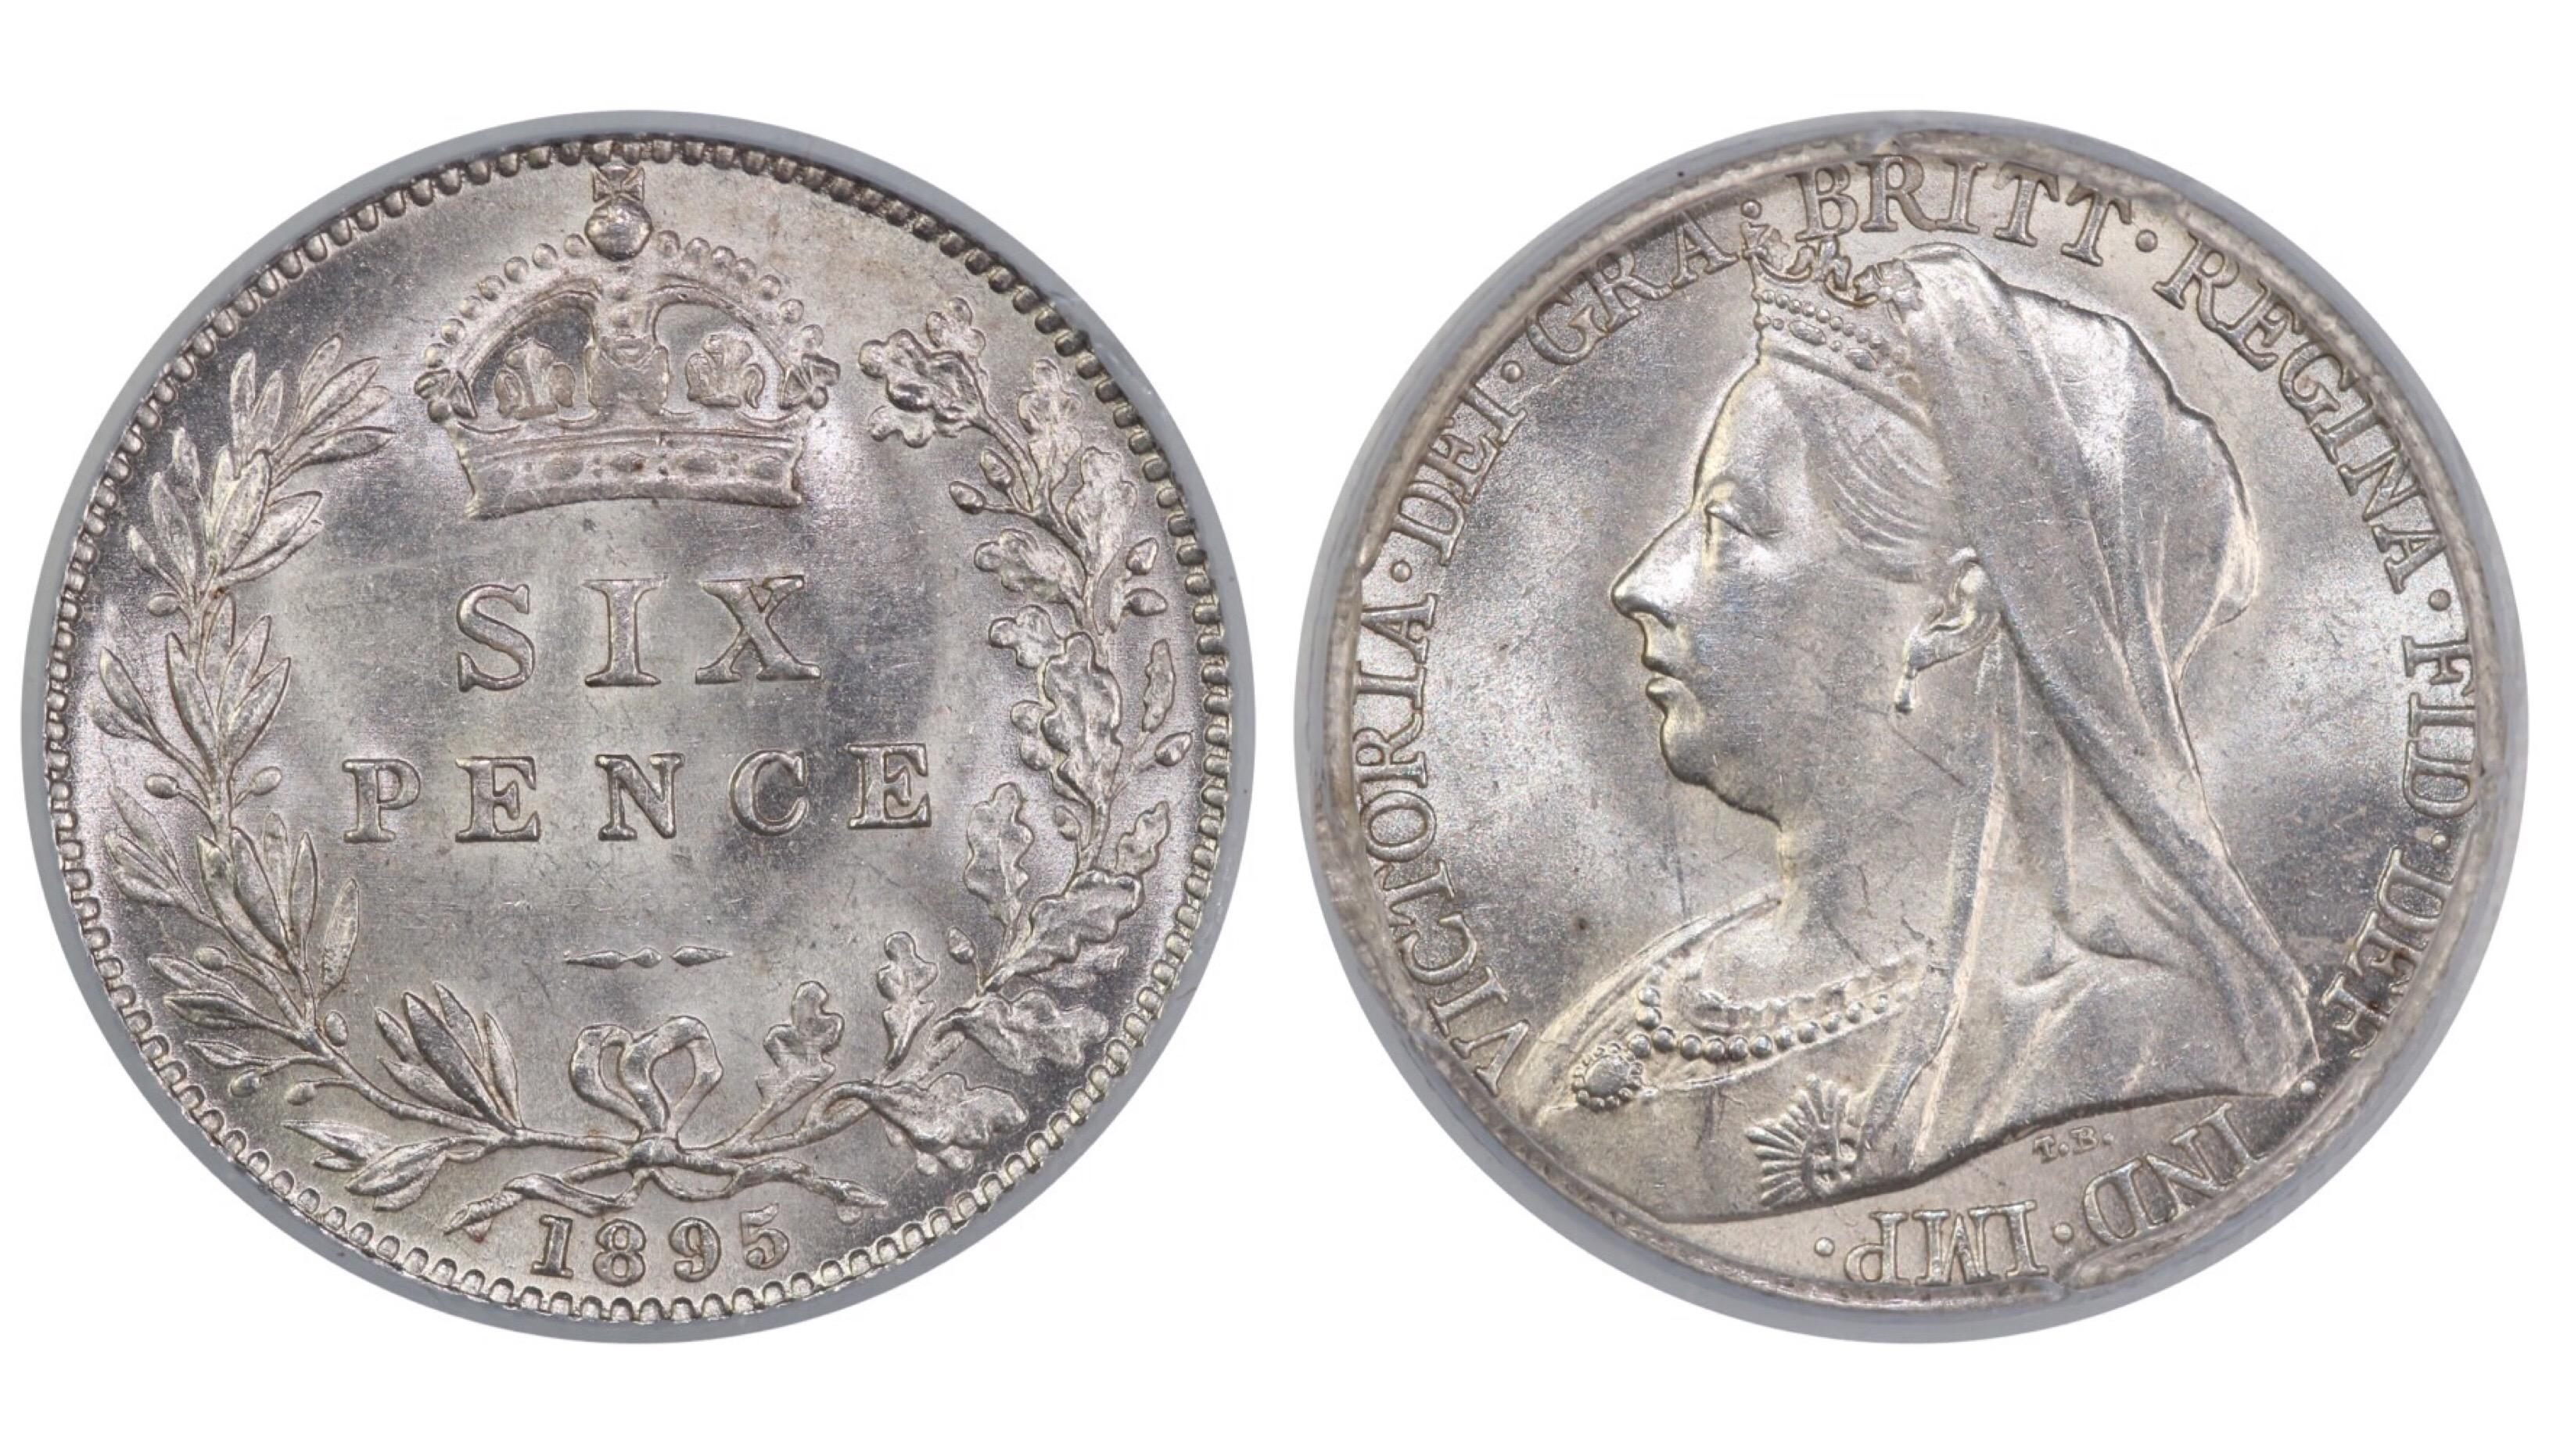 1895 Sixpence, CGS 78, ESC 1765, UIN 22825